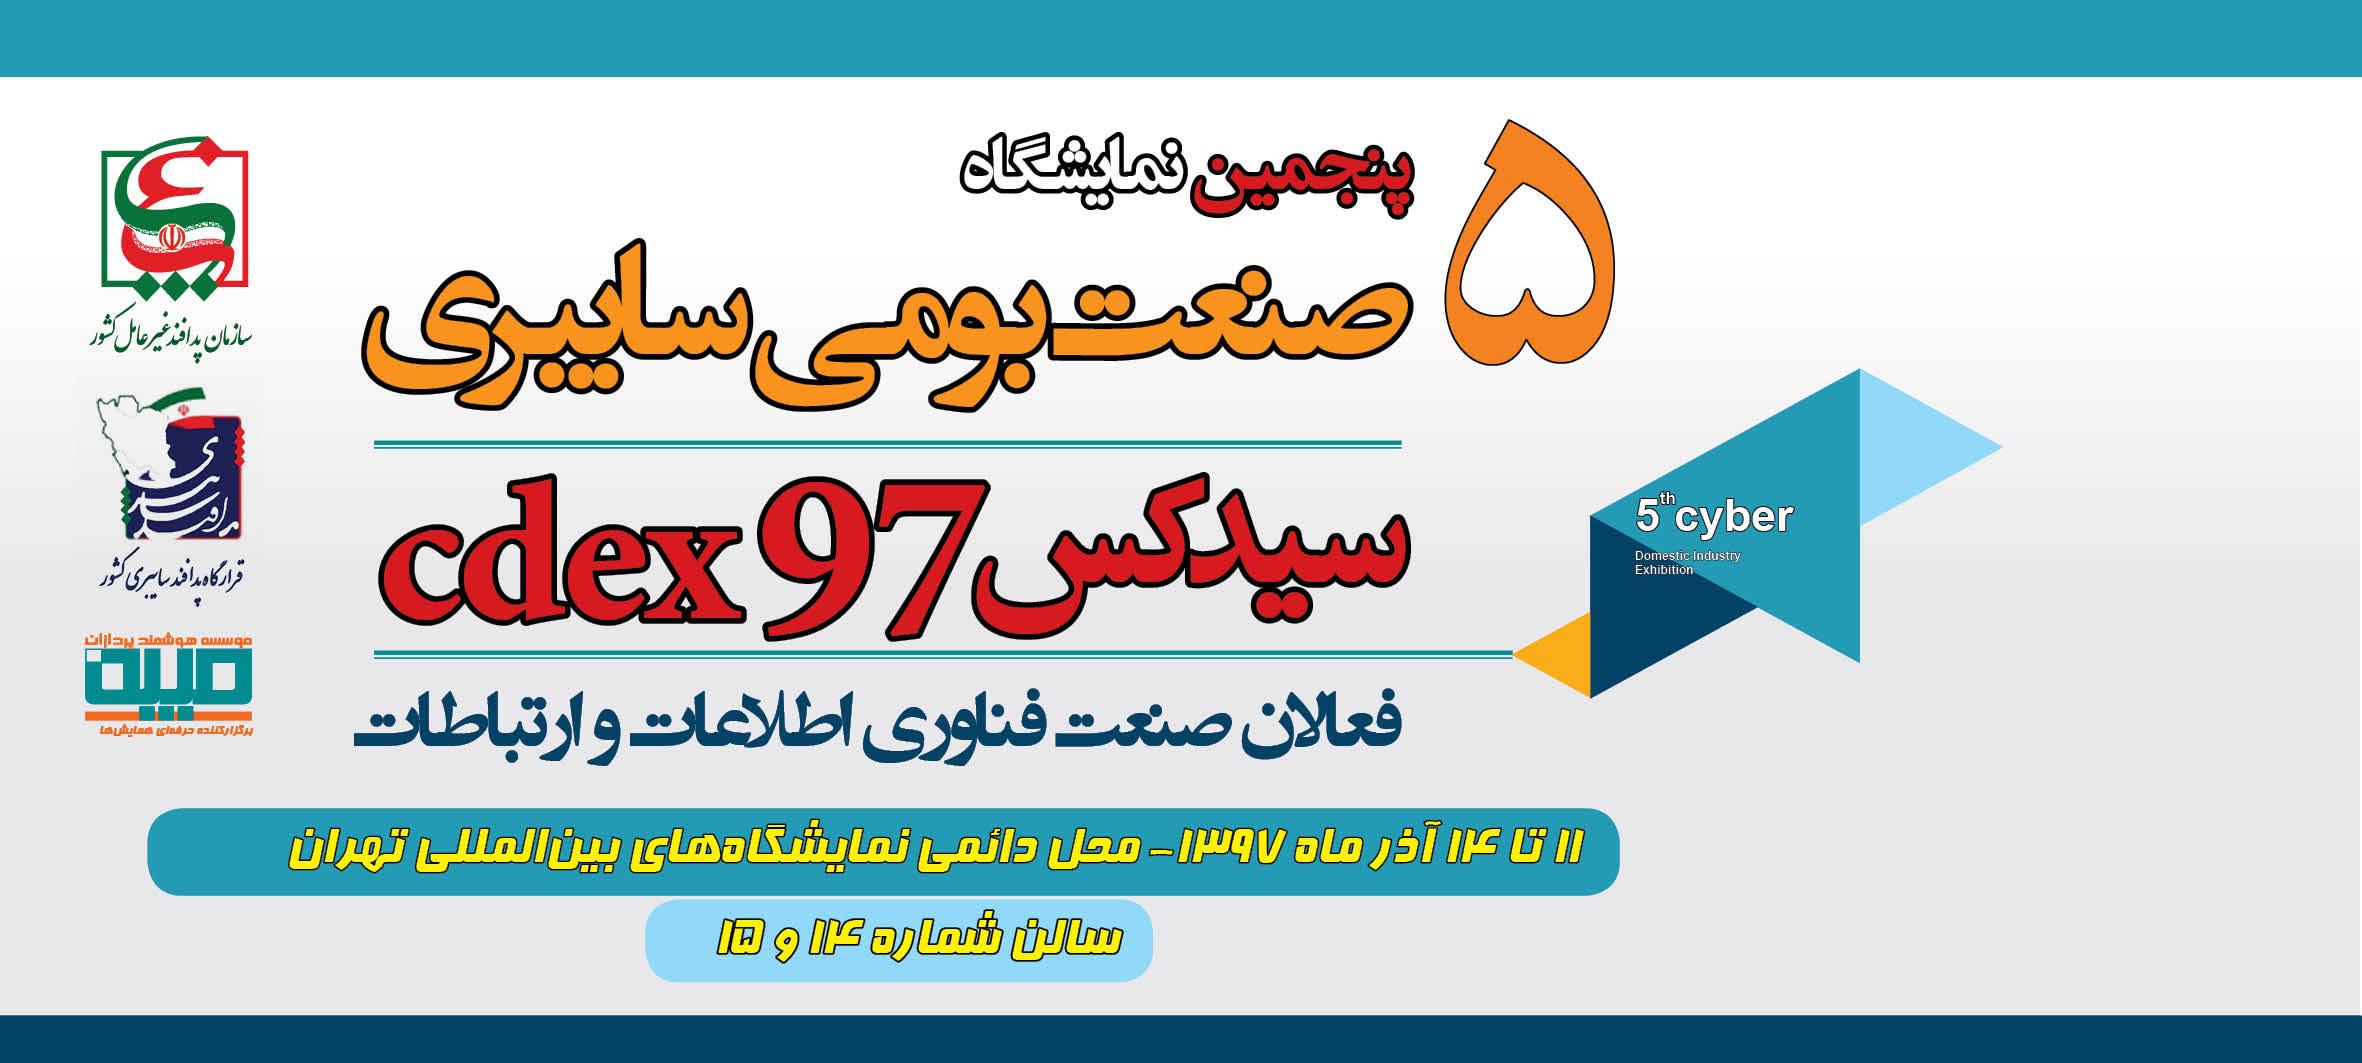 Tehran International Exhibition of Native cyber industry & Bio